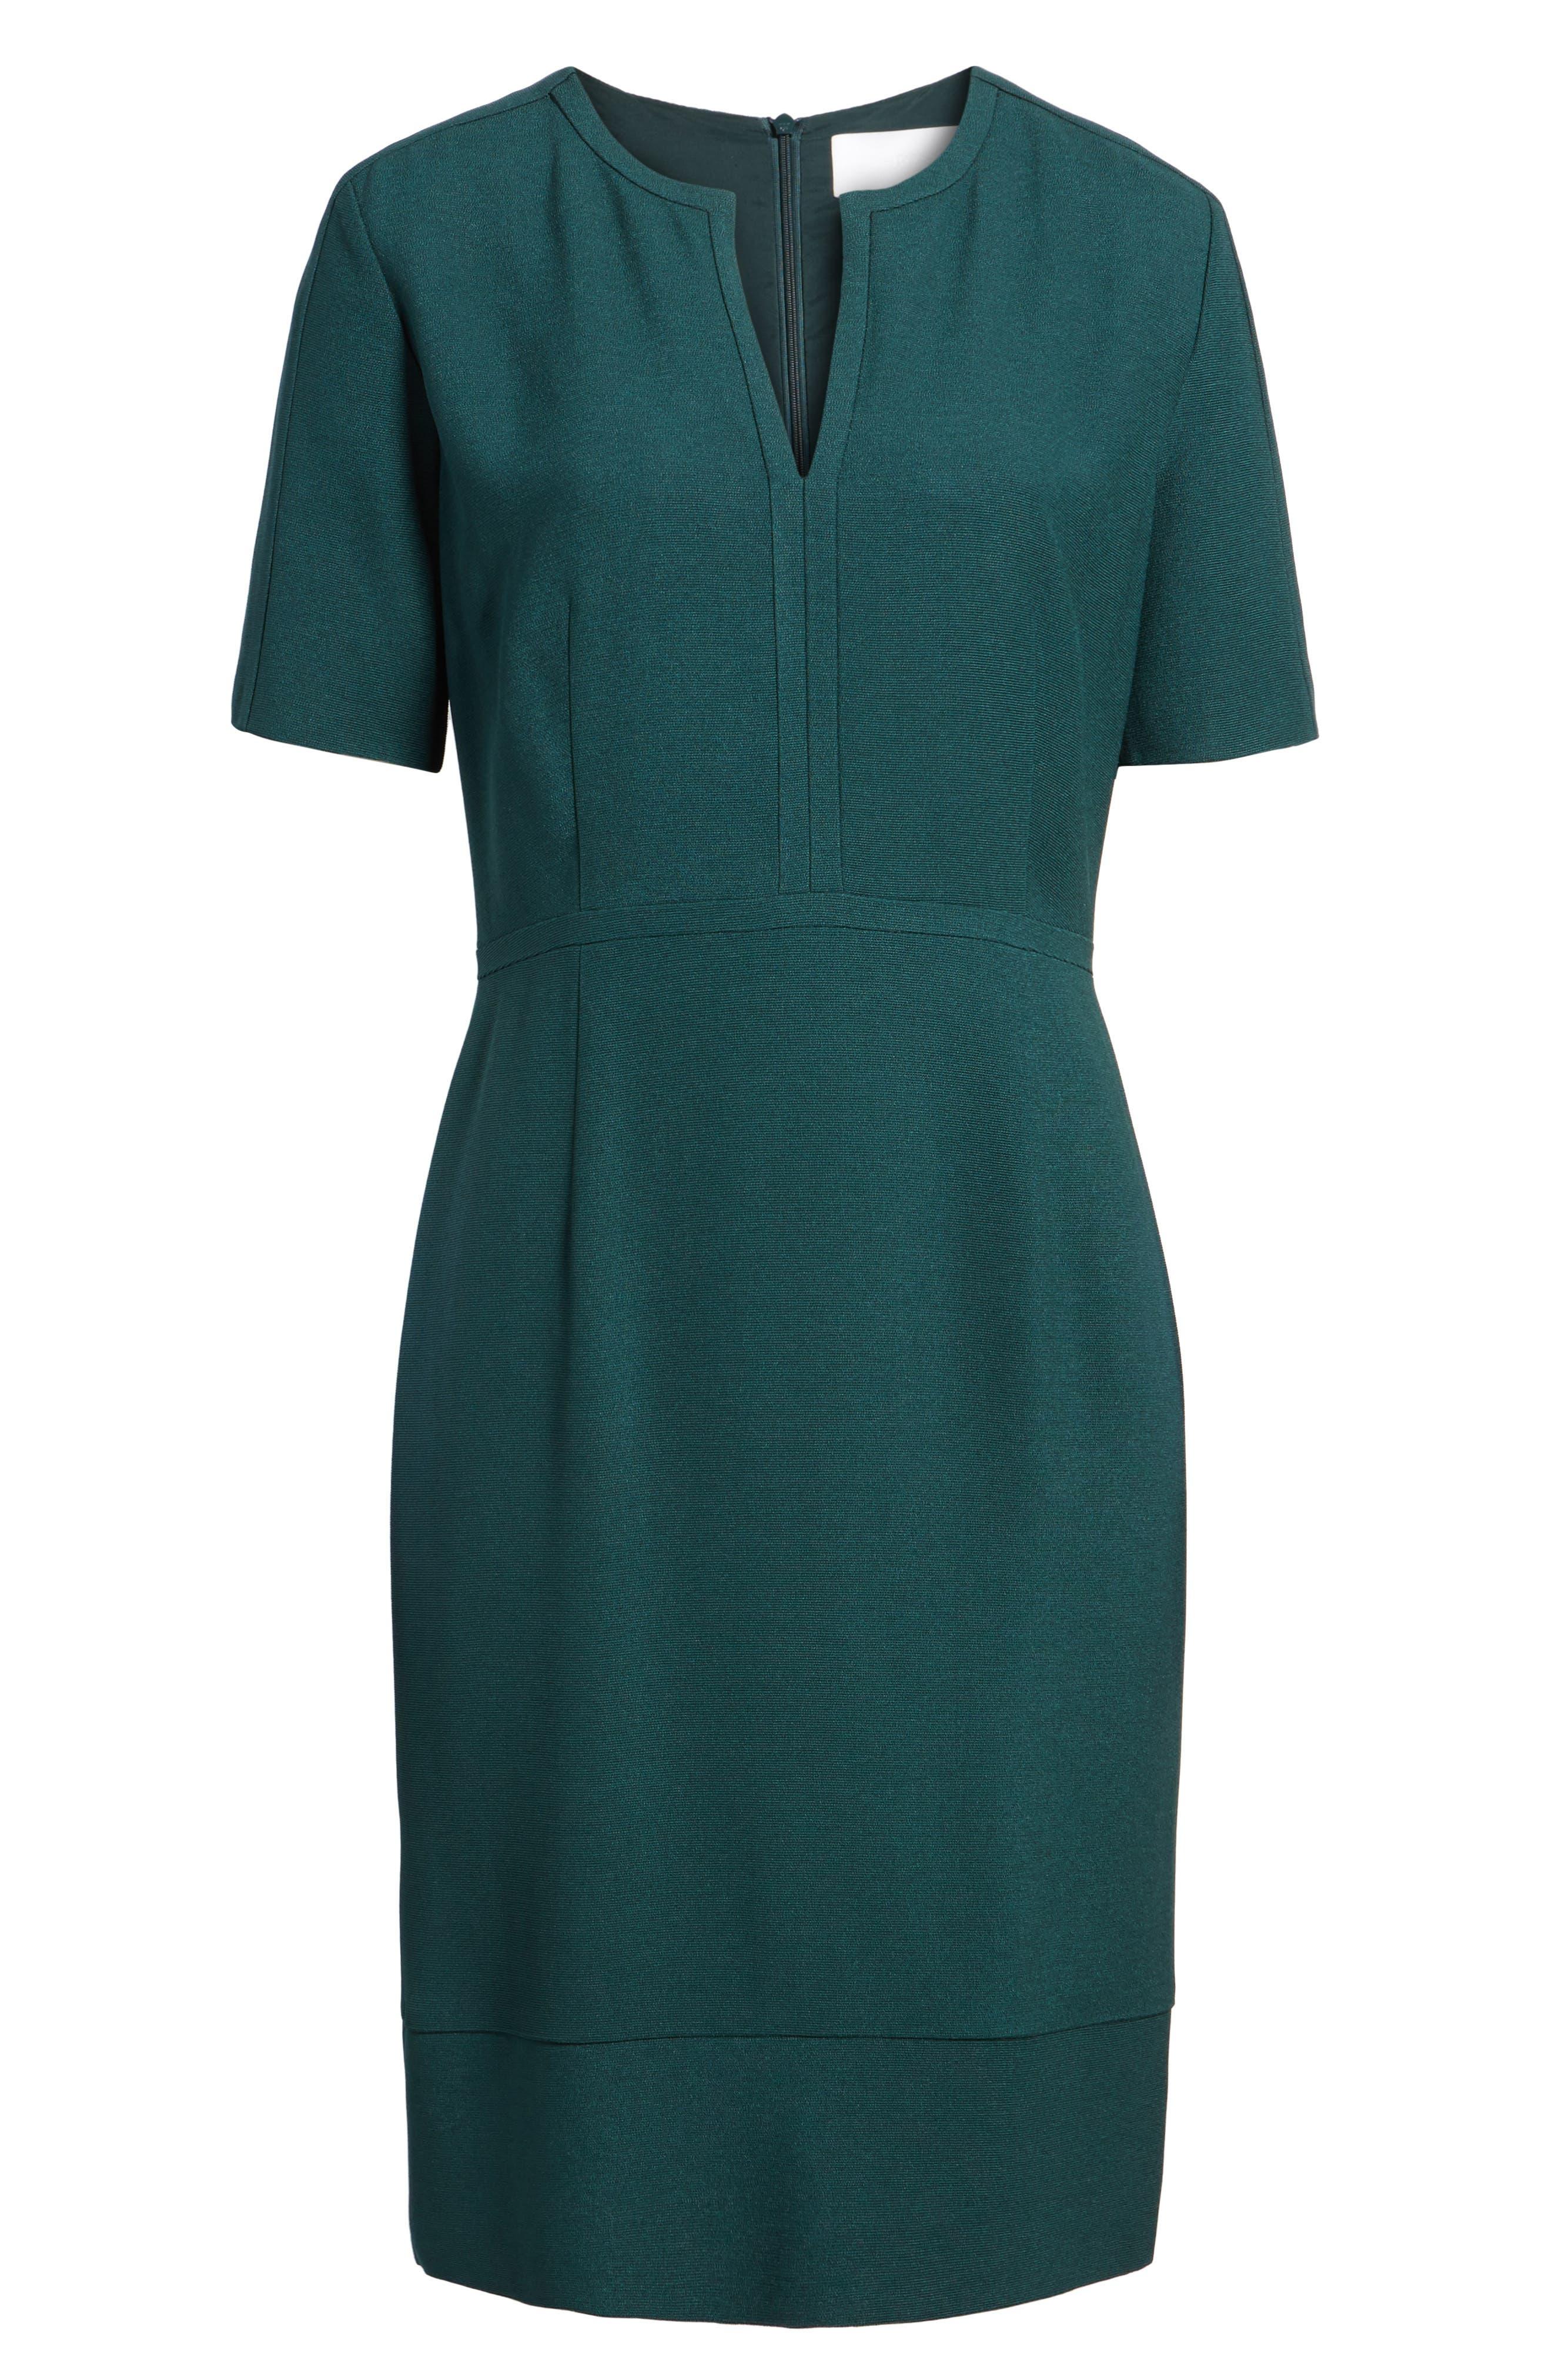 Dalesana Sheath Dress,                             Alternate thumbnail 6, color,                             301